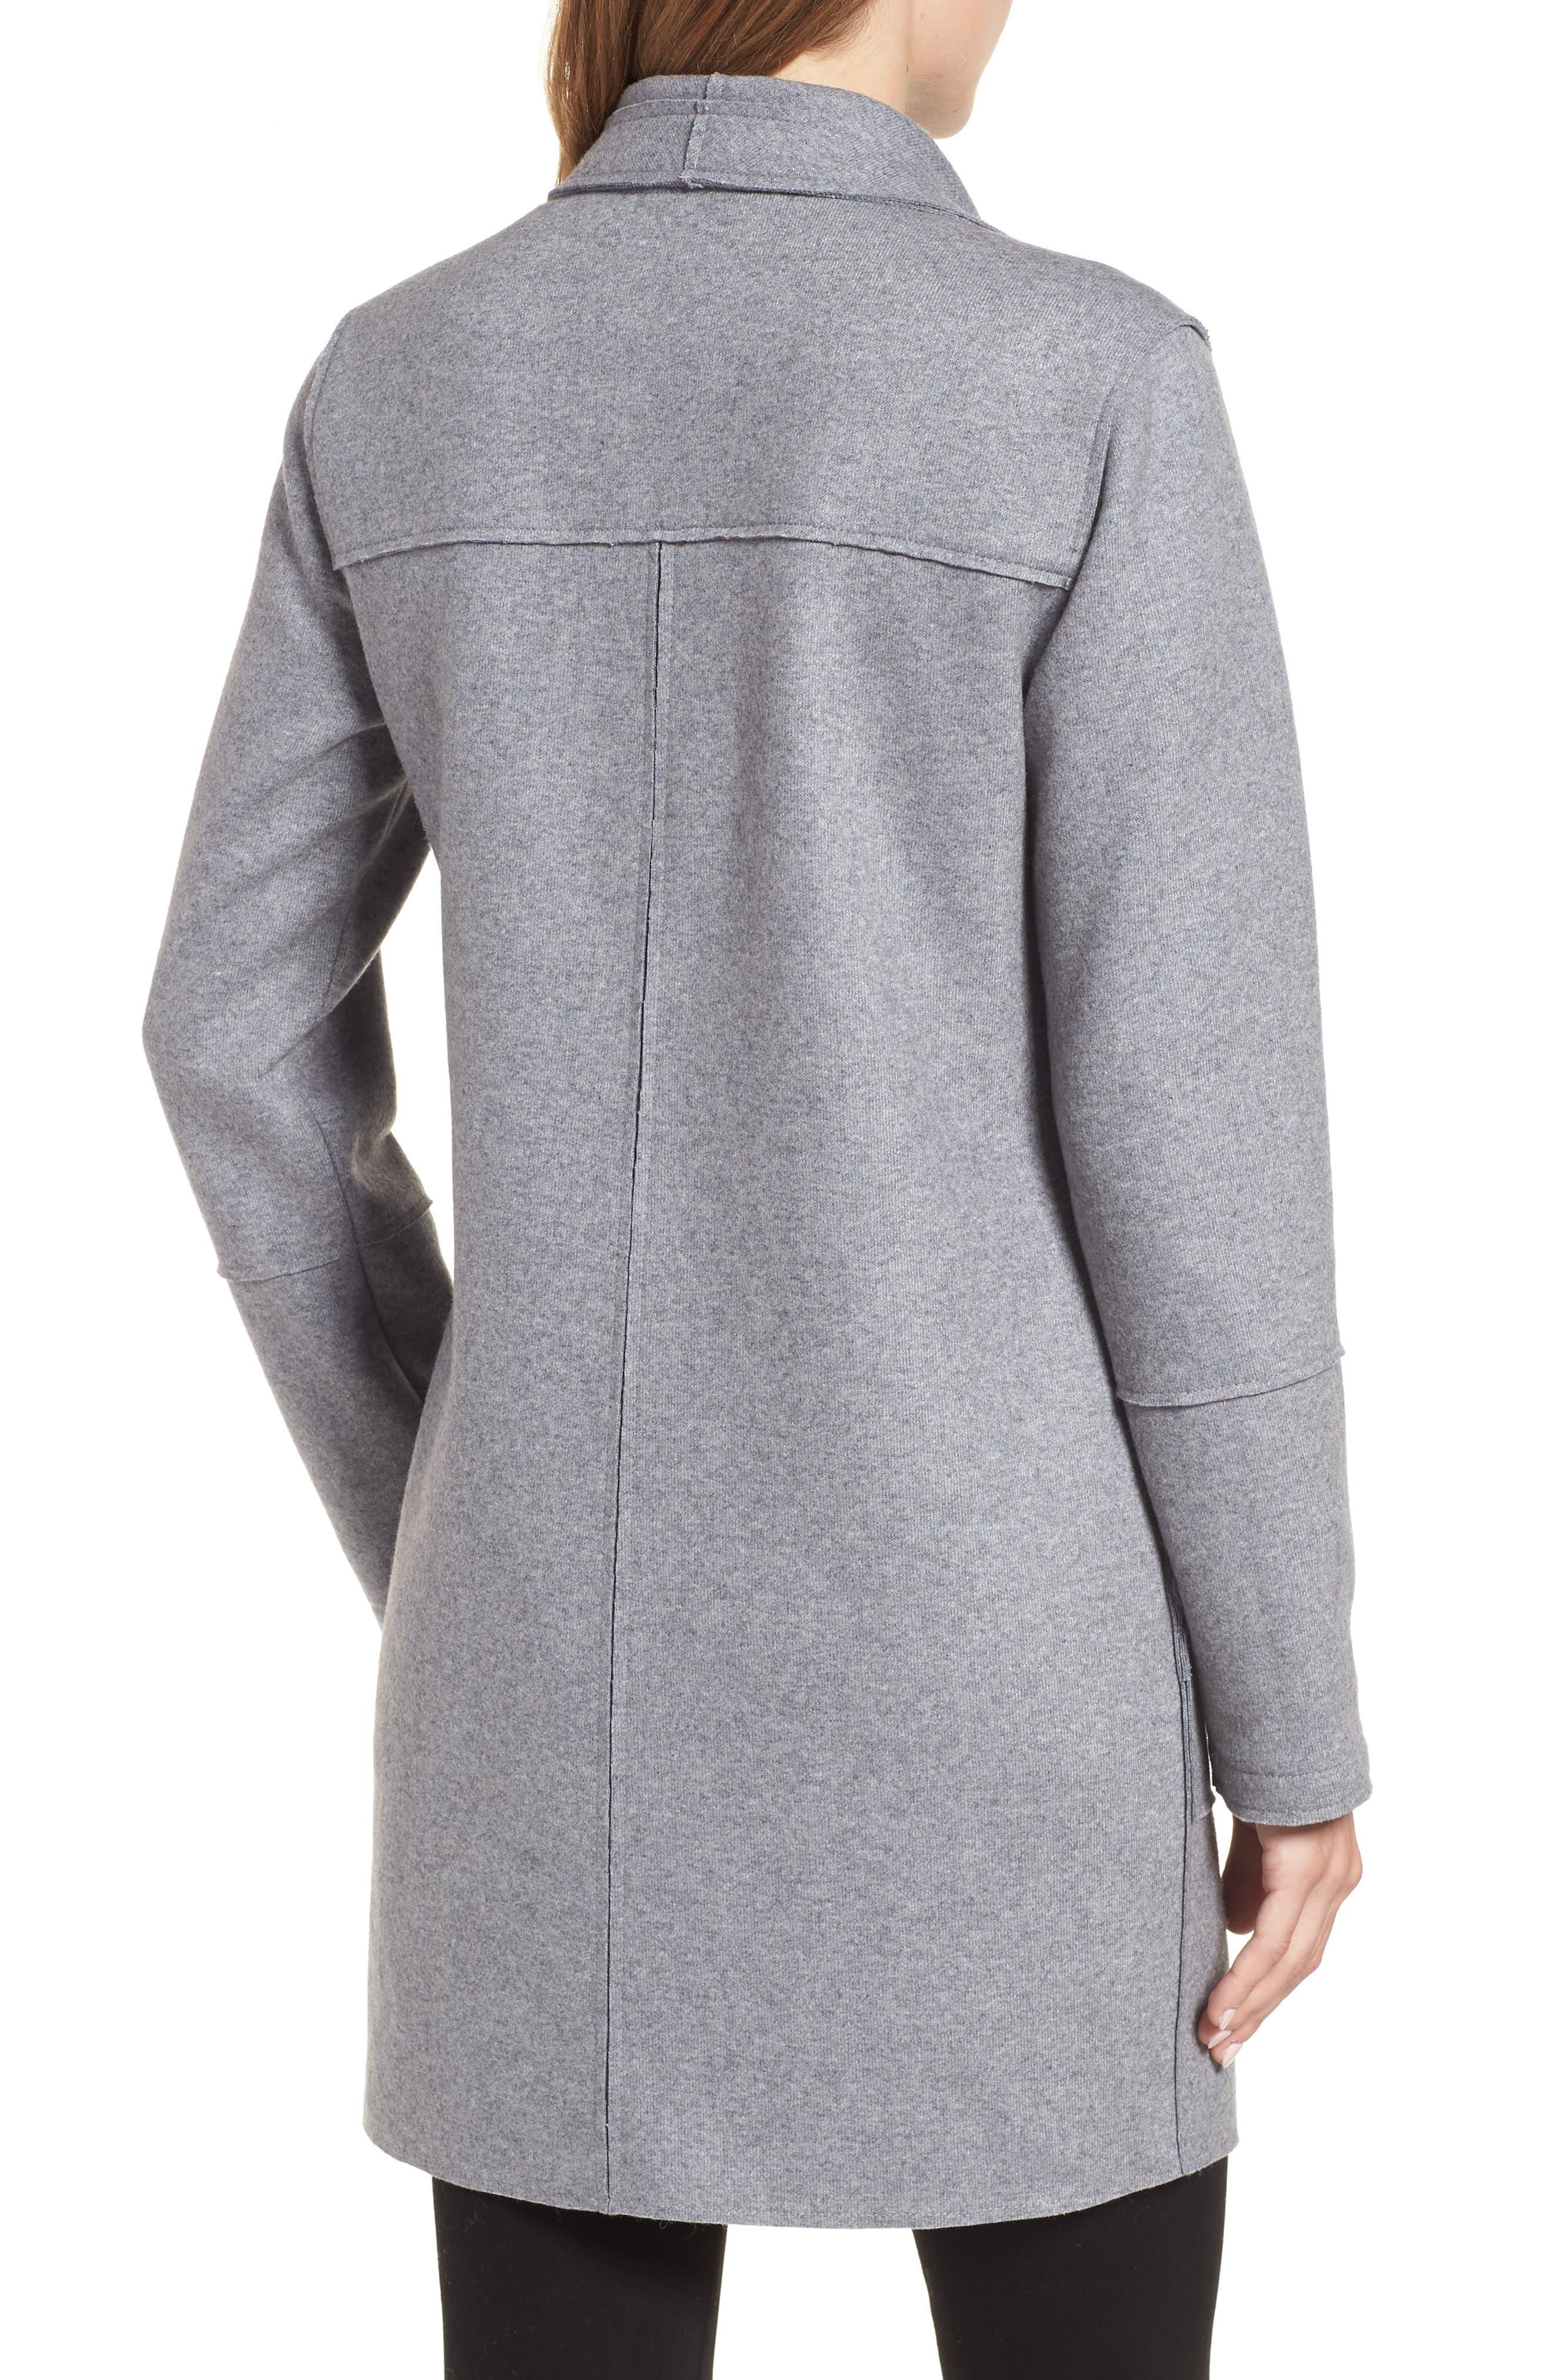 KENNETH COLE NEW YORK,                             Envelope Collar Wool Blend Knit Coat,                             Alternate thumbnail 2, color,                             033